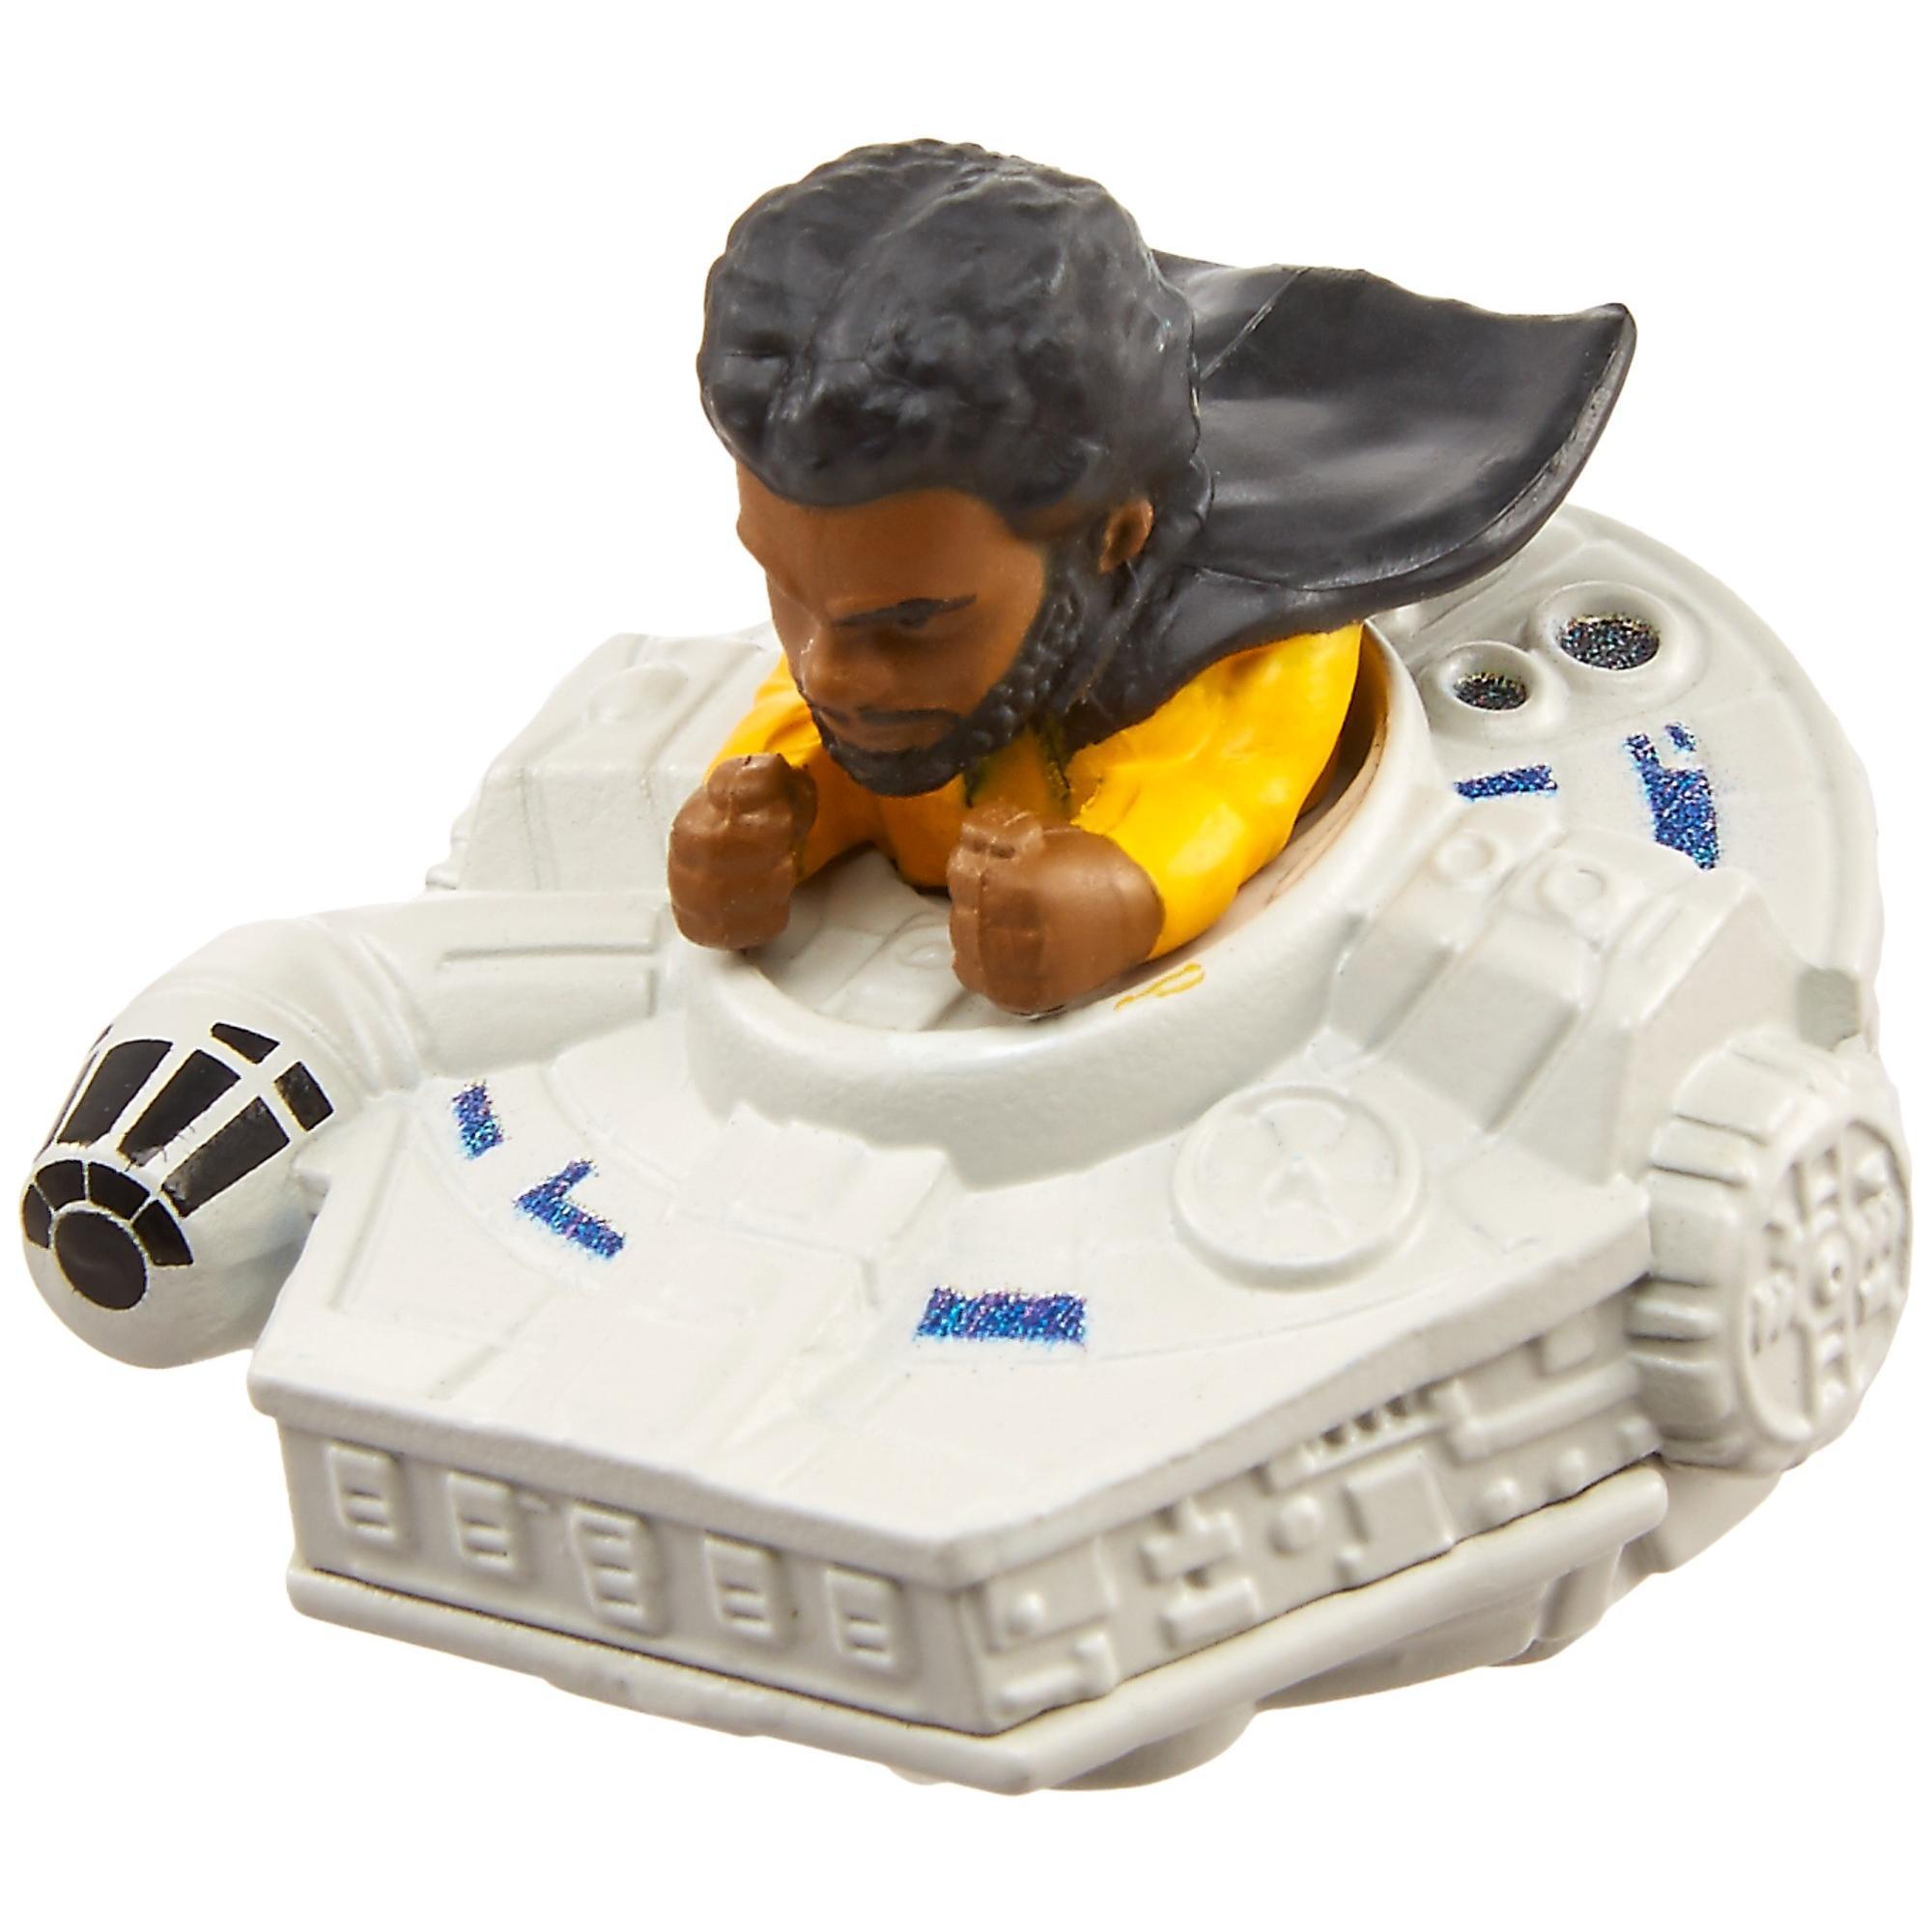 Solo: ASWS HW Lando Calrissian Battle Roller Toy 2